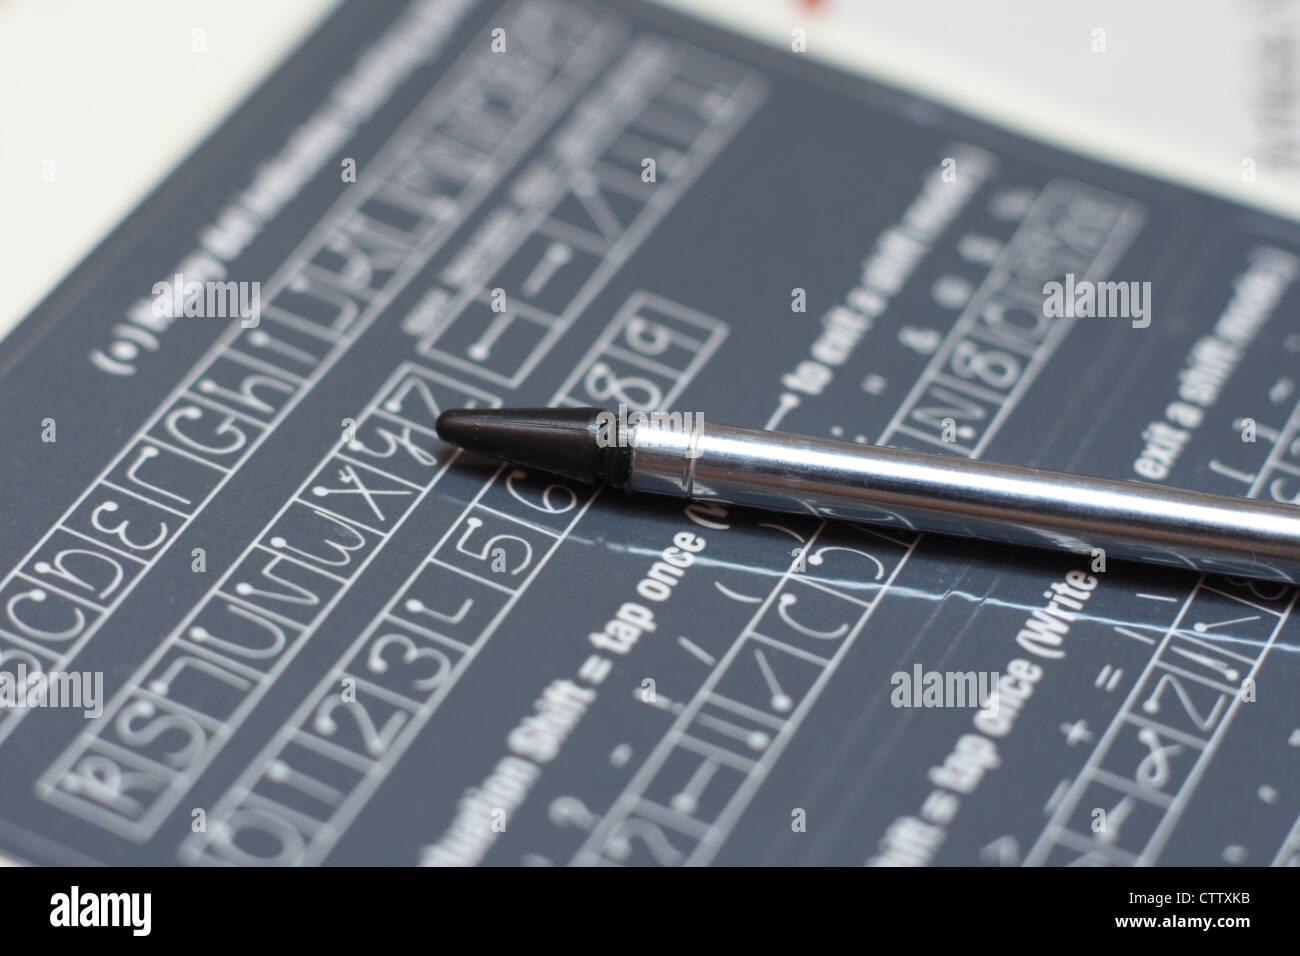 pda stylus on handwriting guide - Stock Image